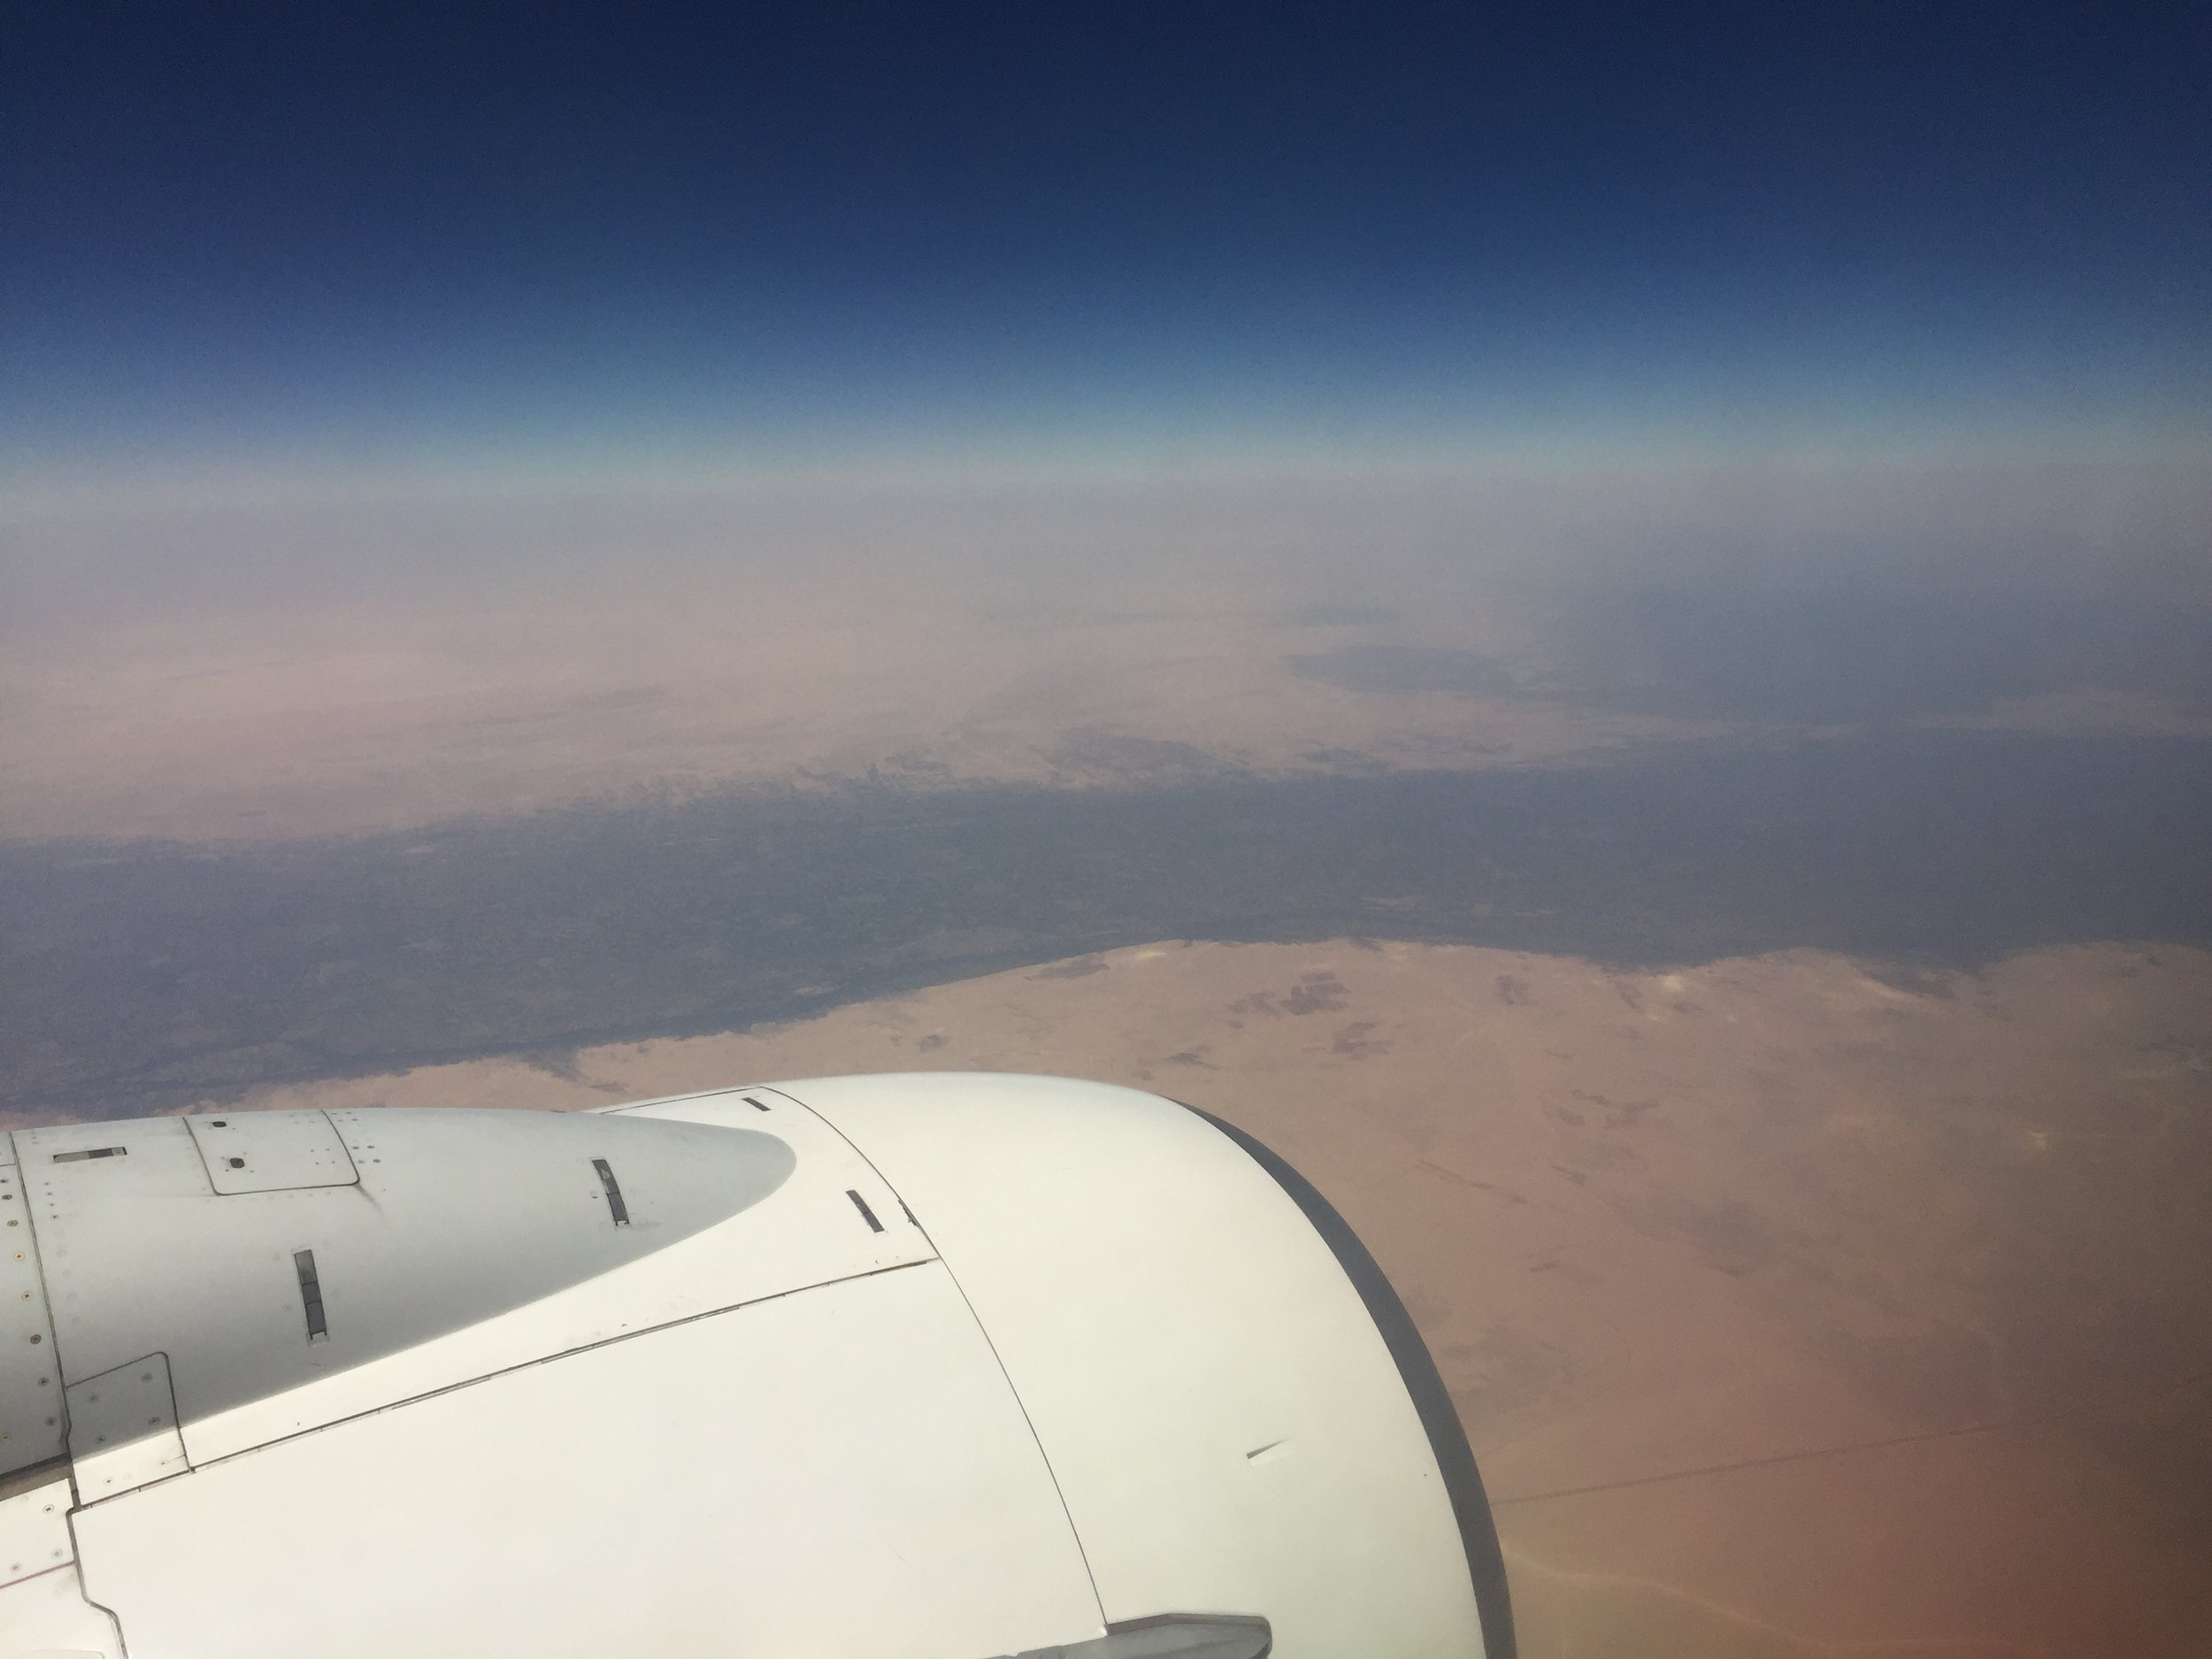 The Nile cutting through the Sahara.